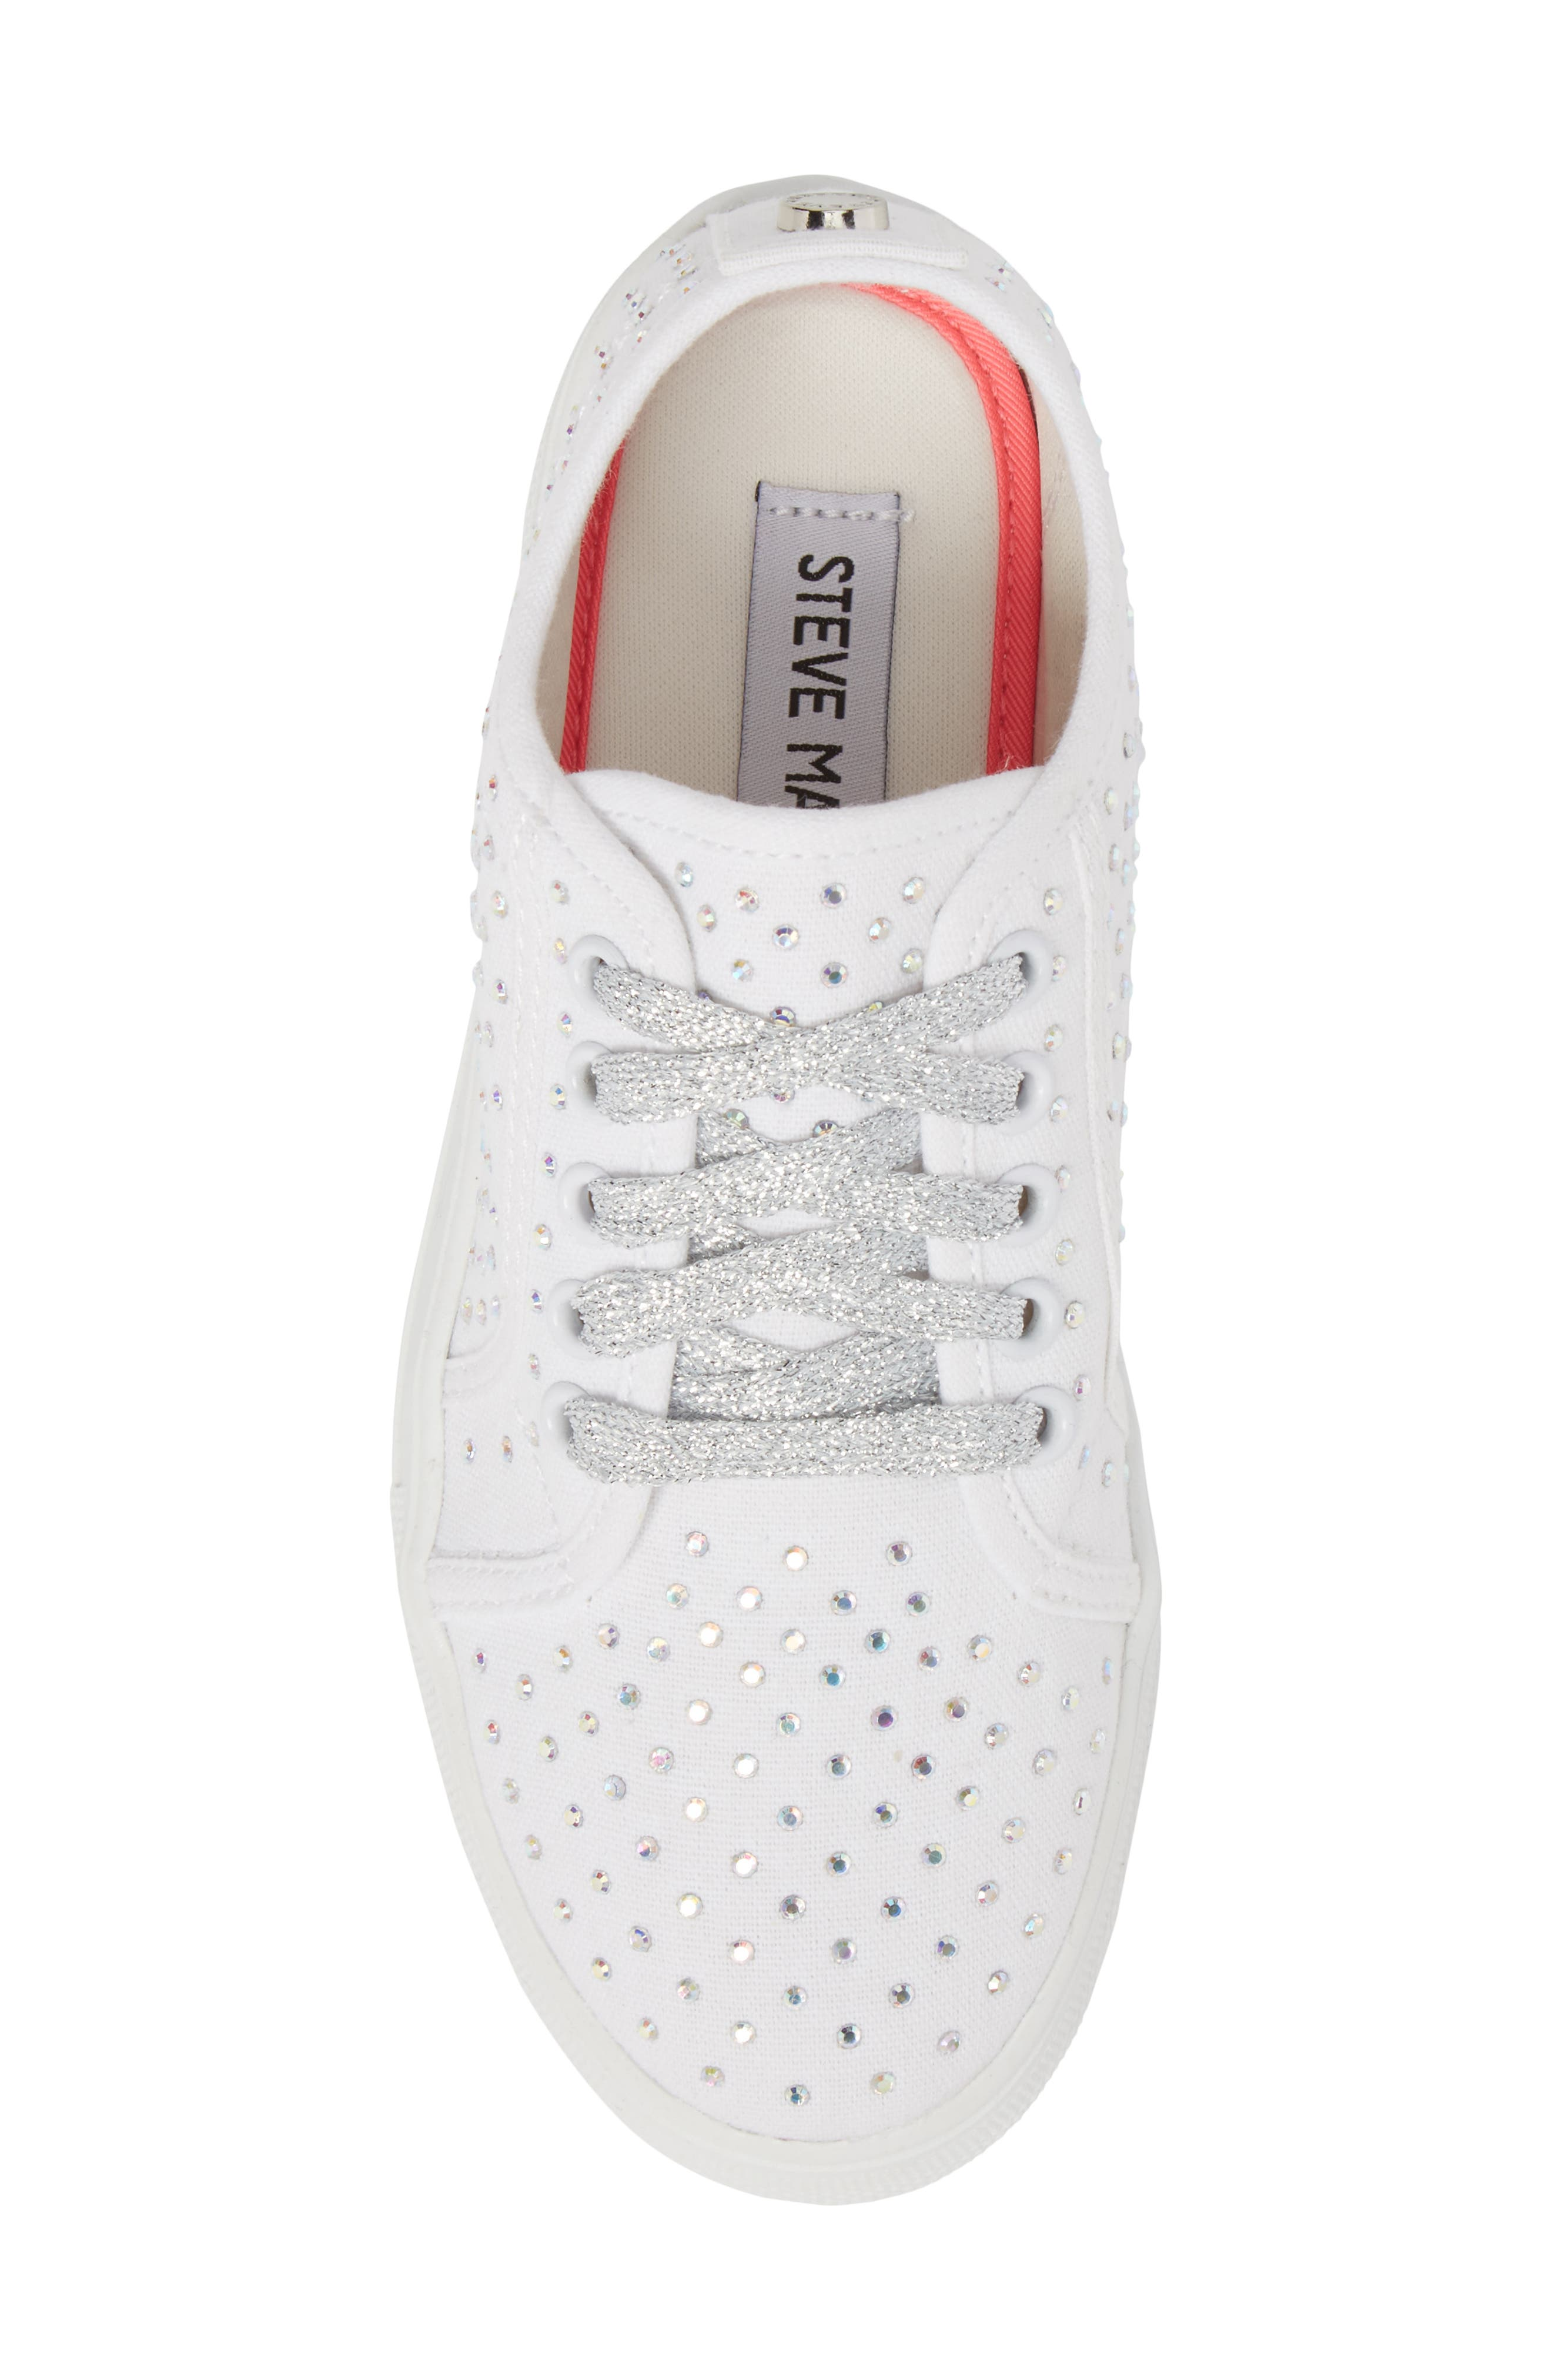 Jmono Sneaker,                             Alternate thumbnail 5, color,                             100